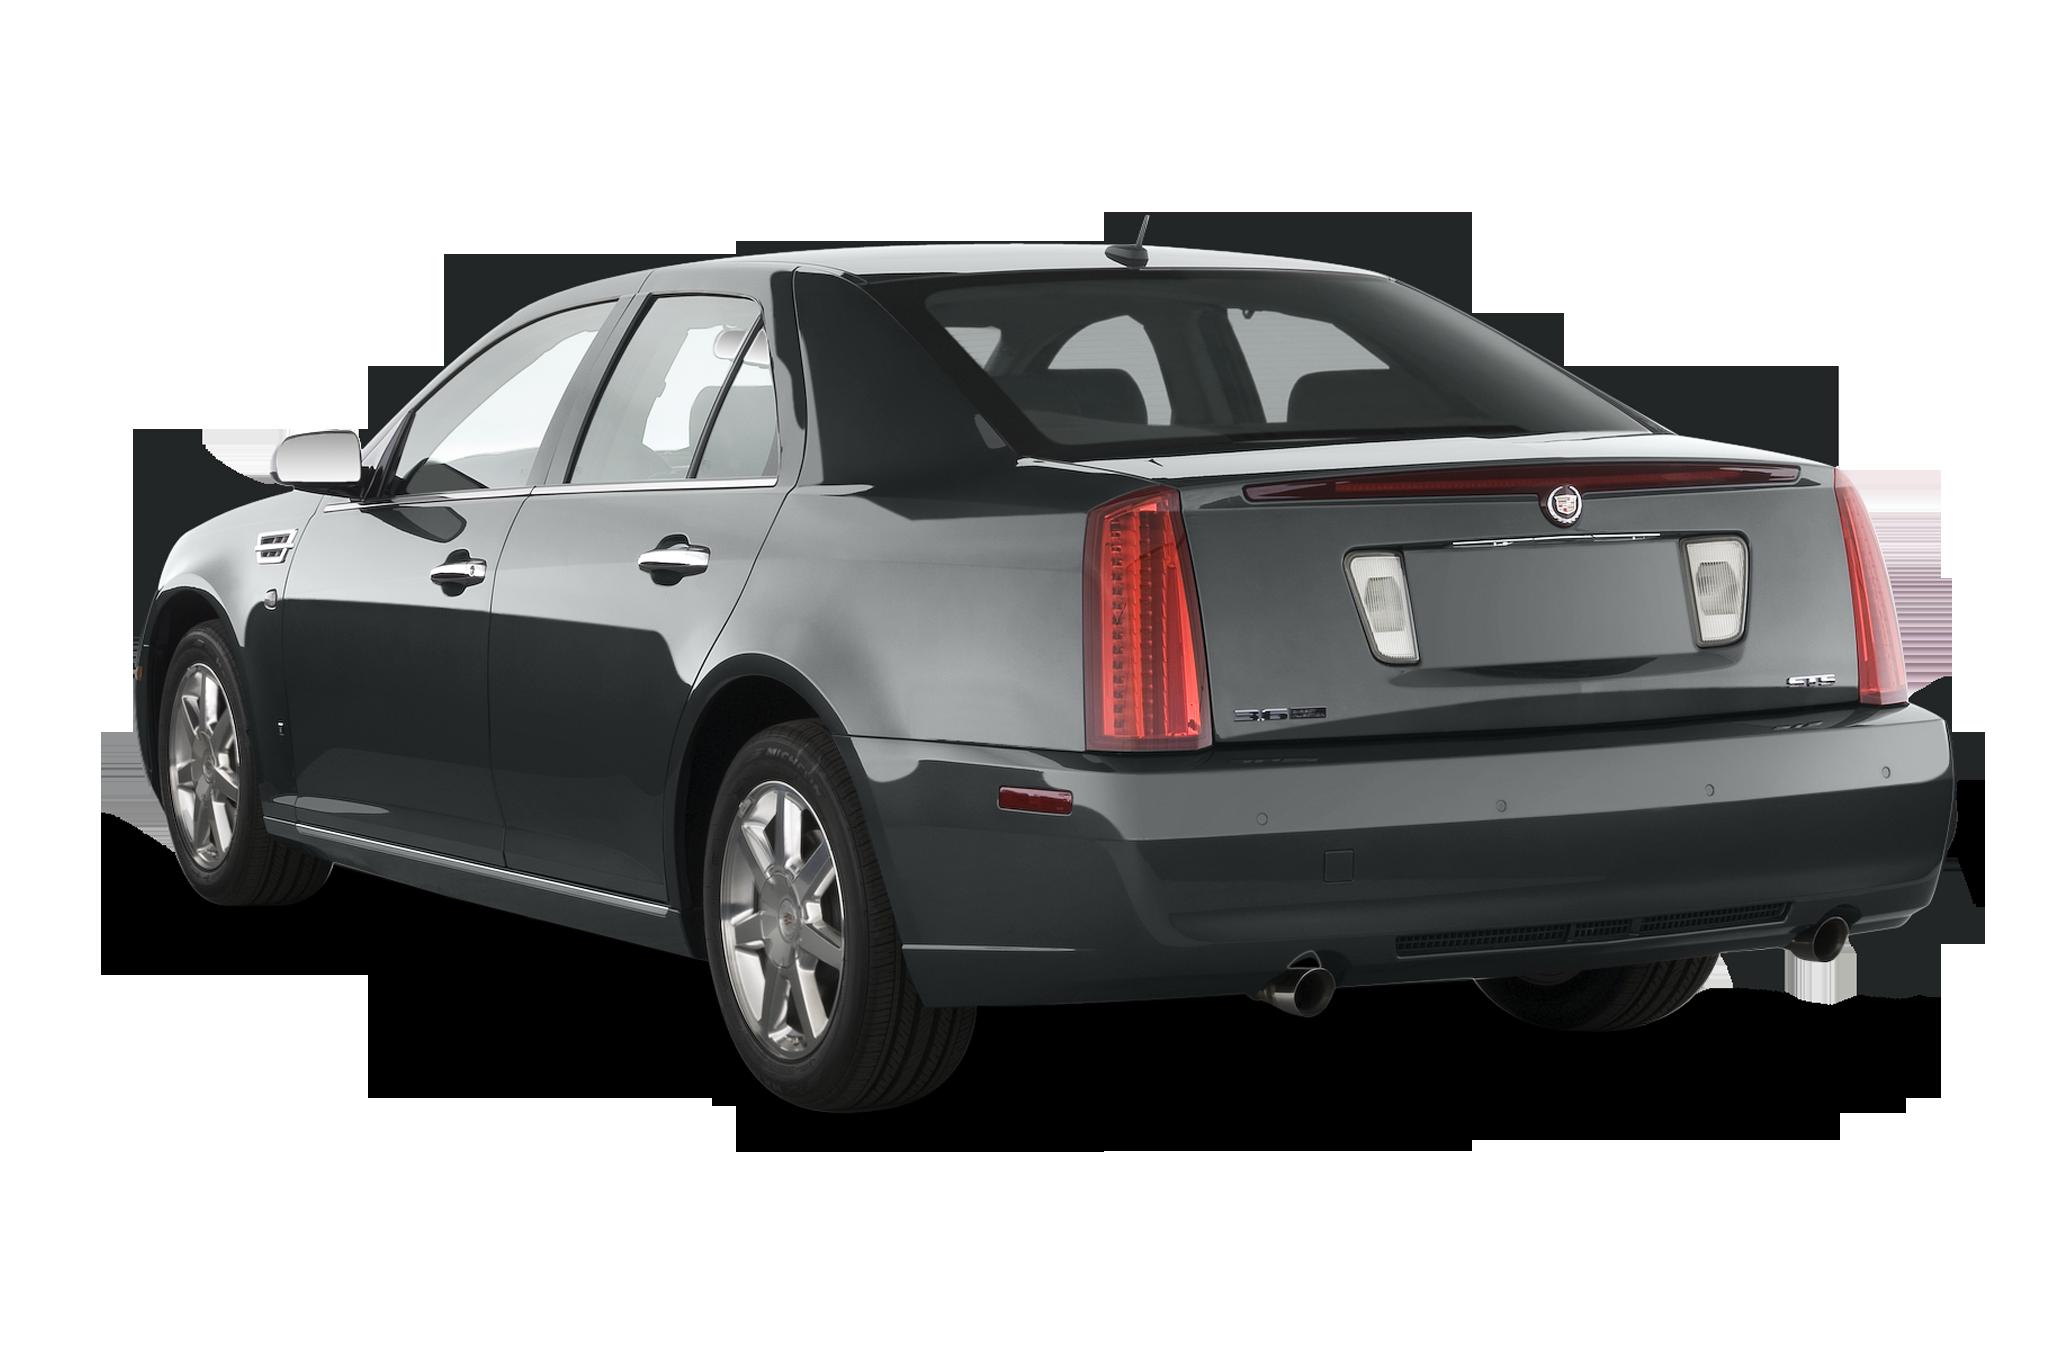 price cadillac sts sedan overview international performance prices intl specs